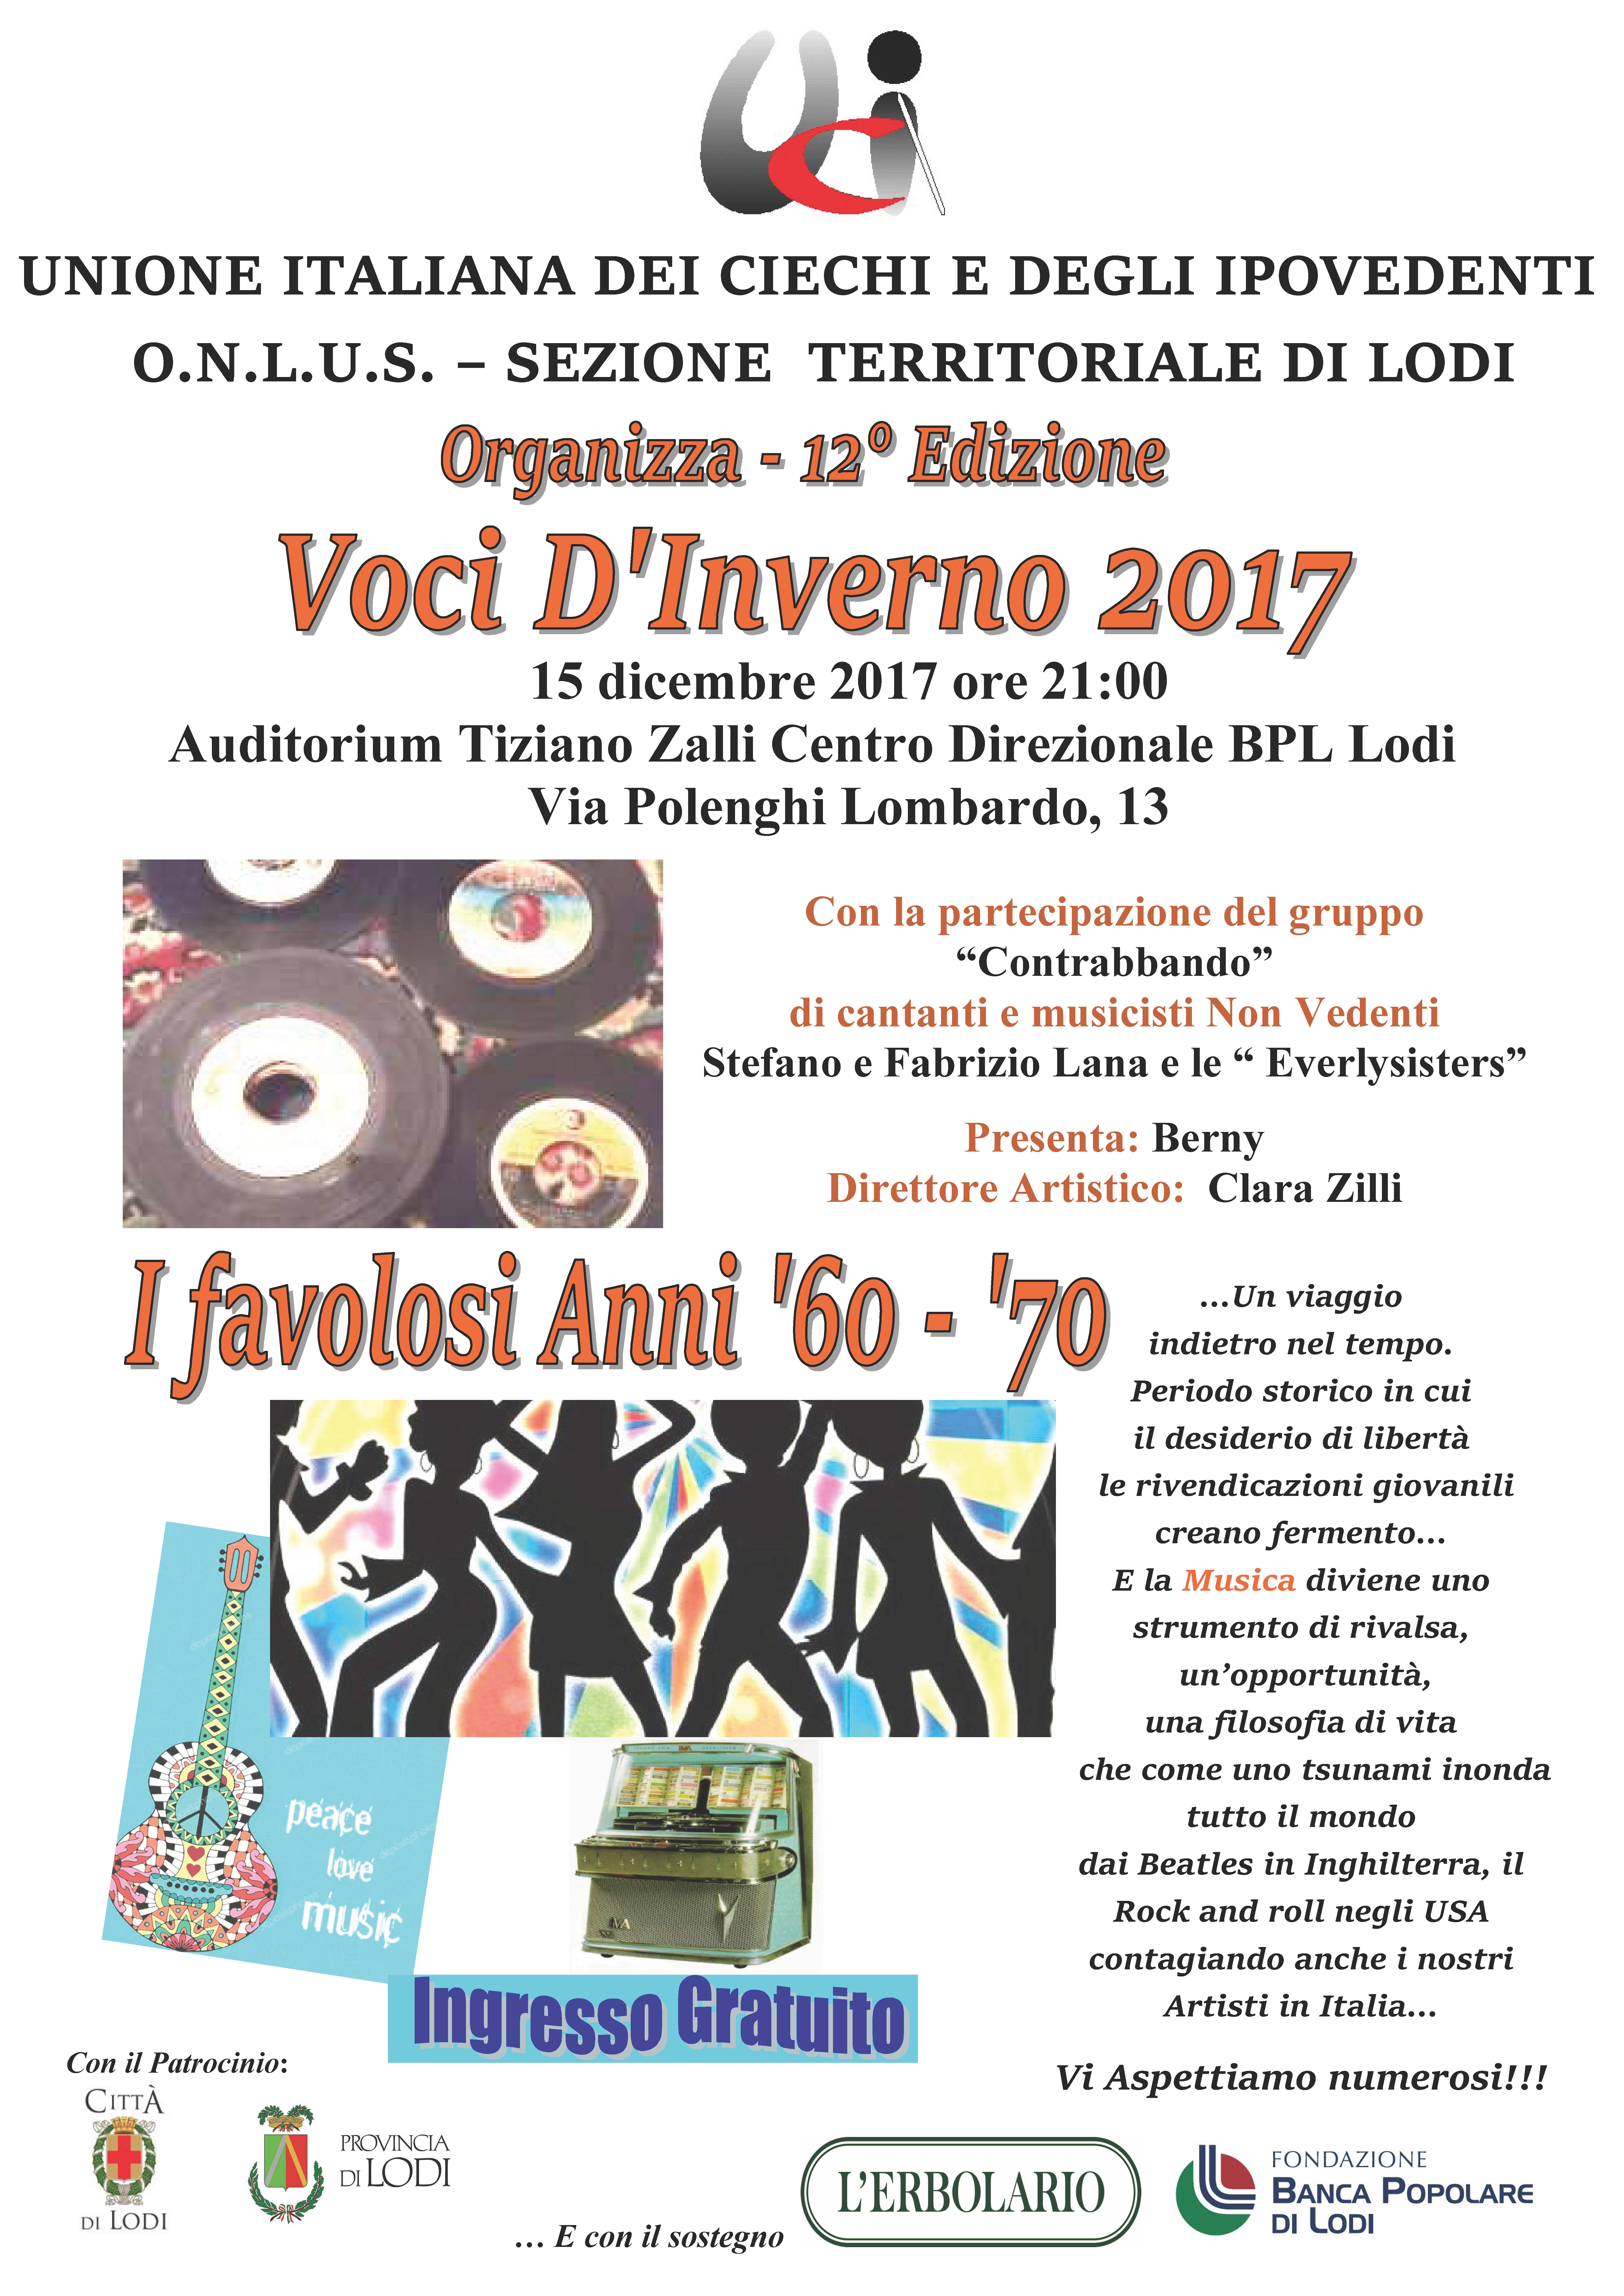 LOCANDINA VOCI D'INVERNO 2017 definitiva-2.jpg